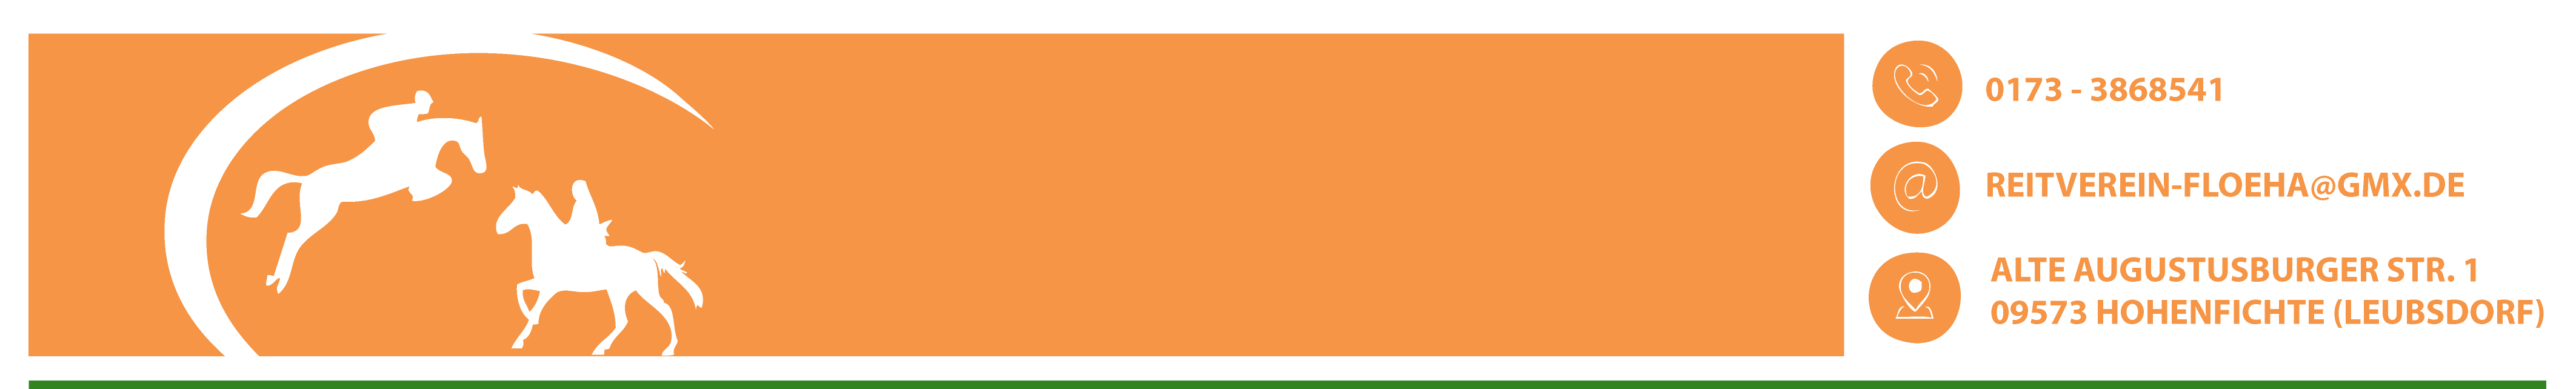 Logo Reitverein Floeha